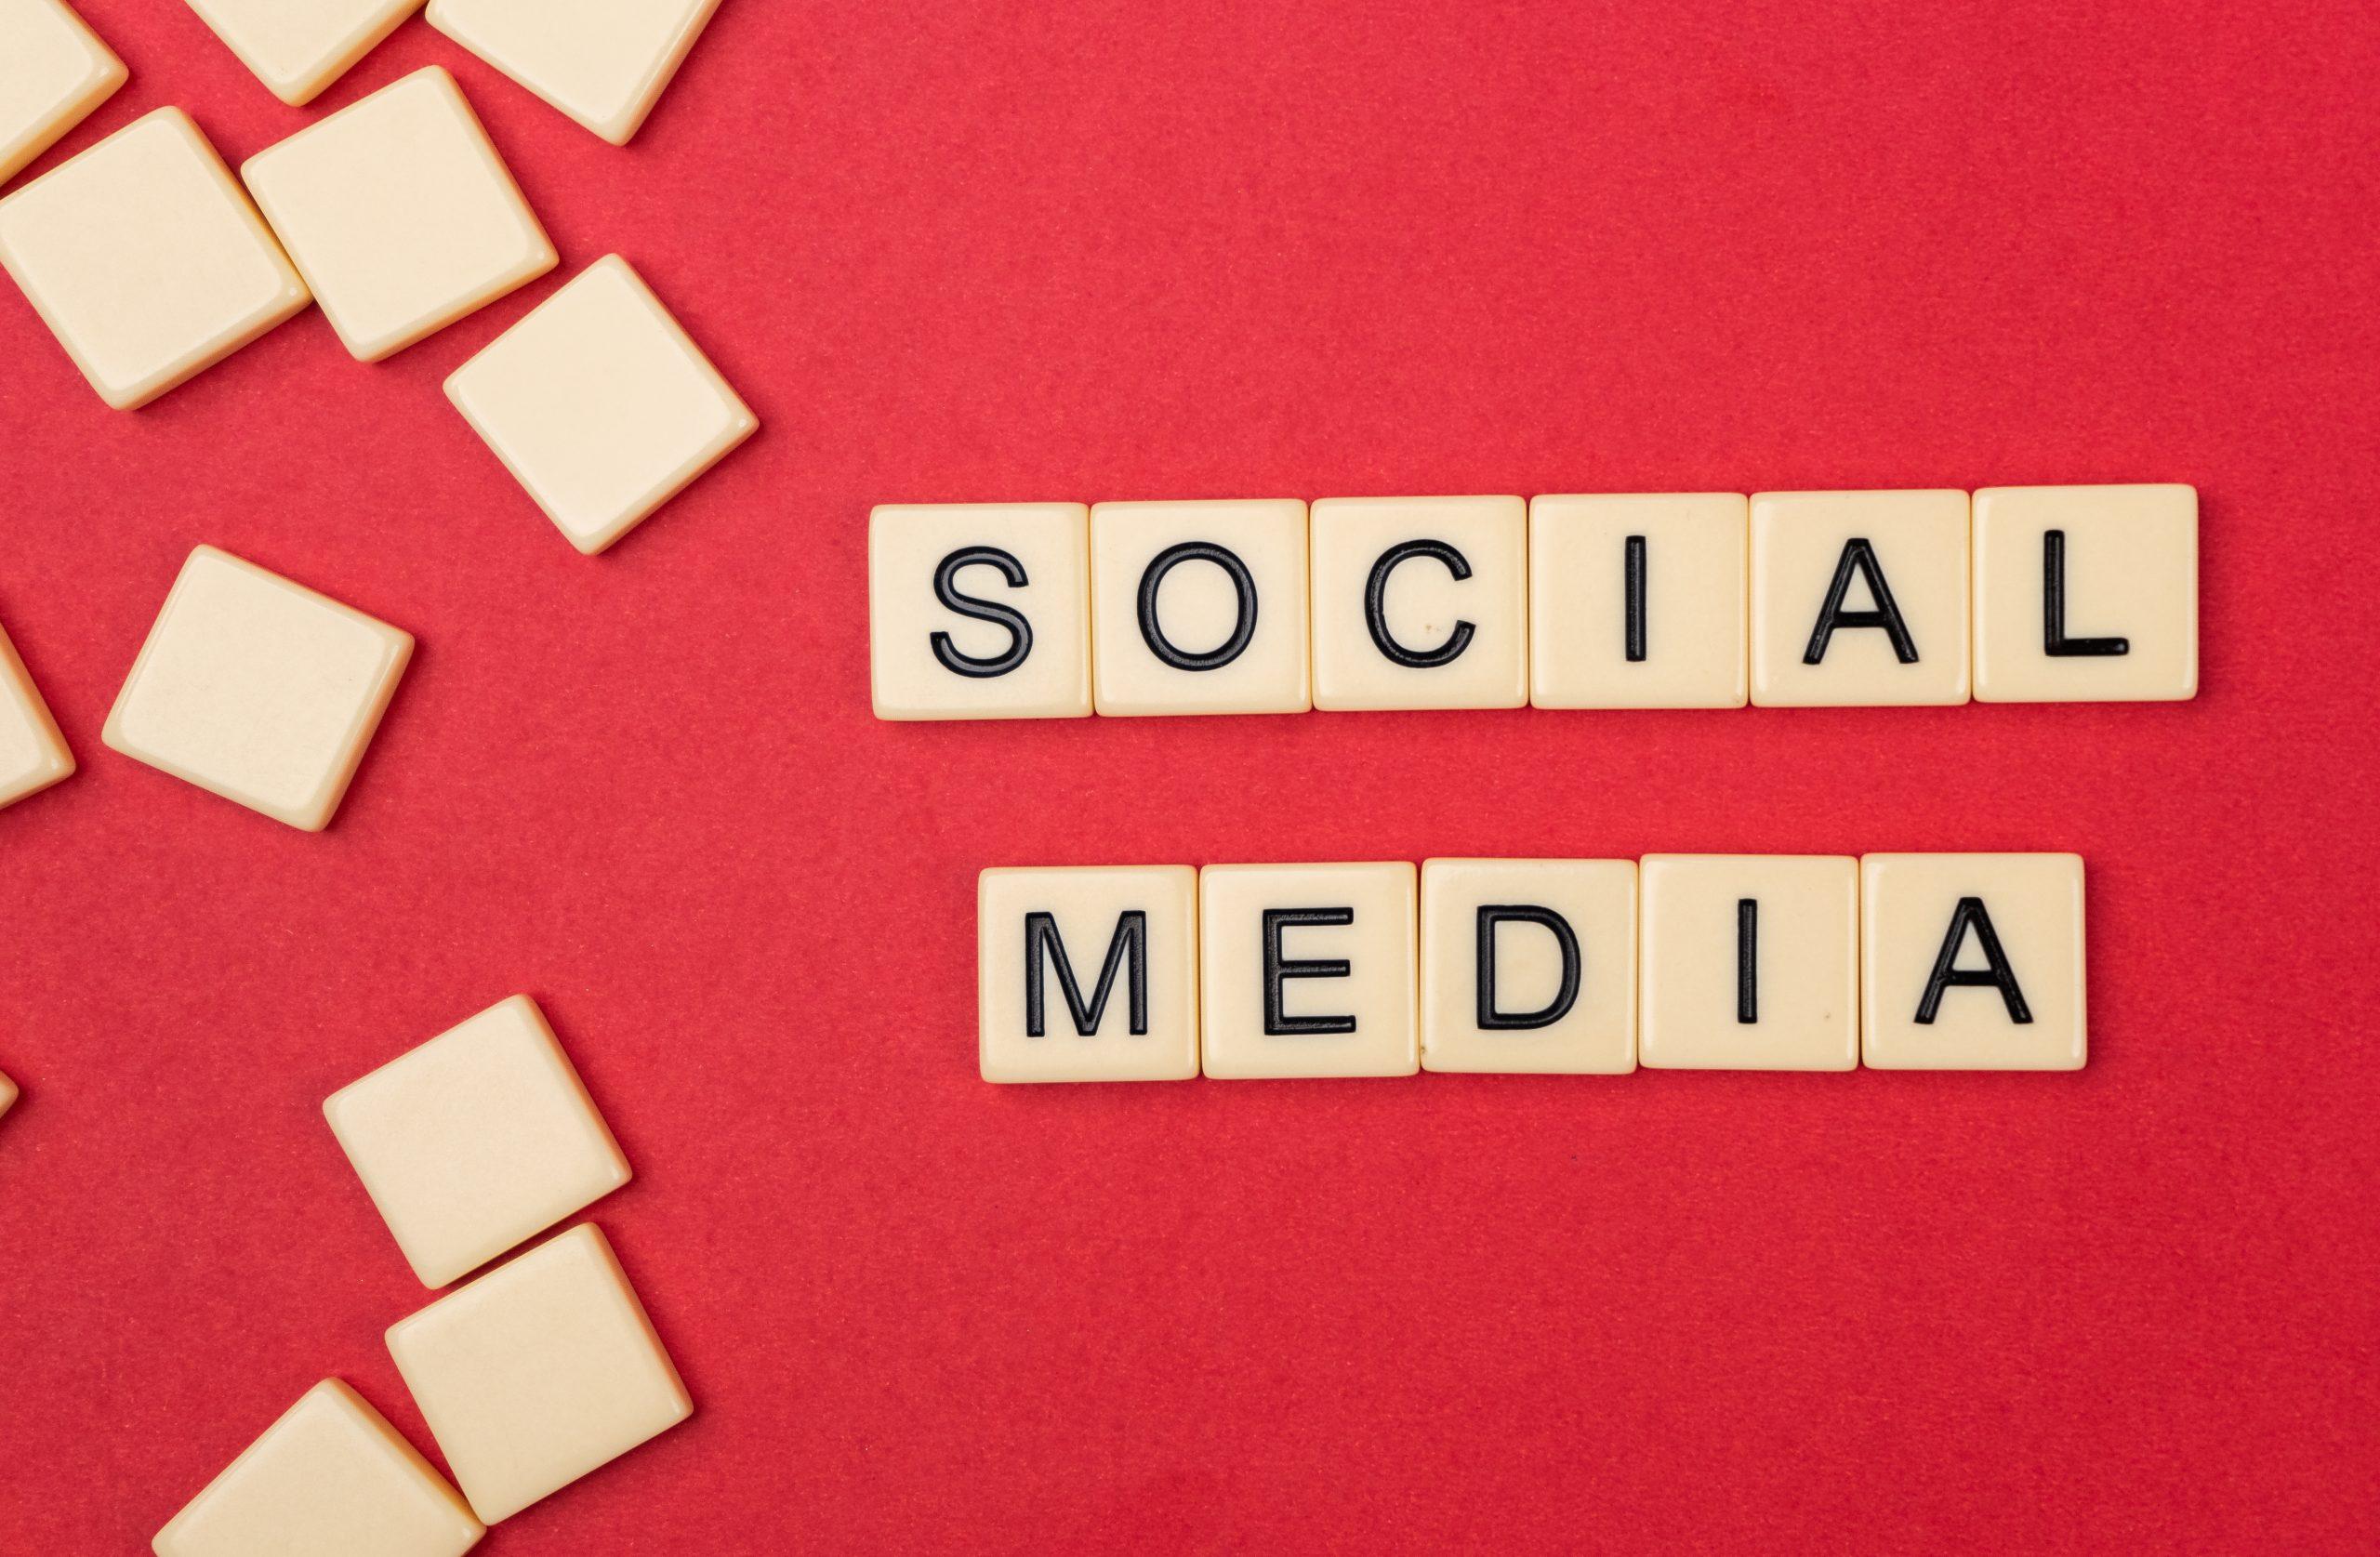 Social media in Words